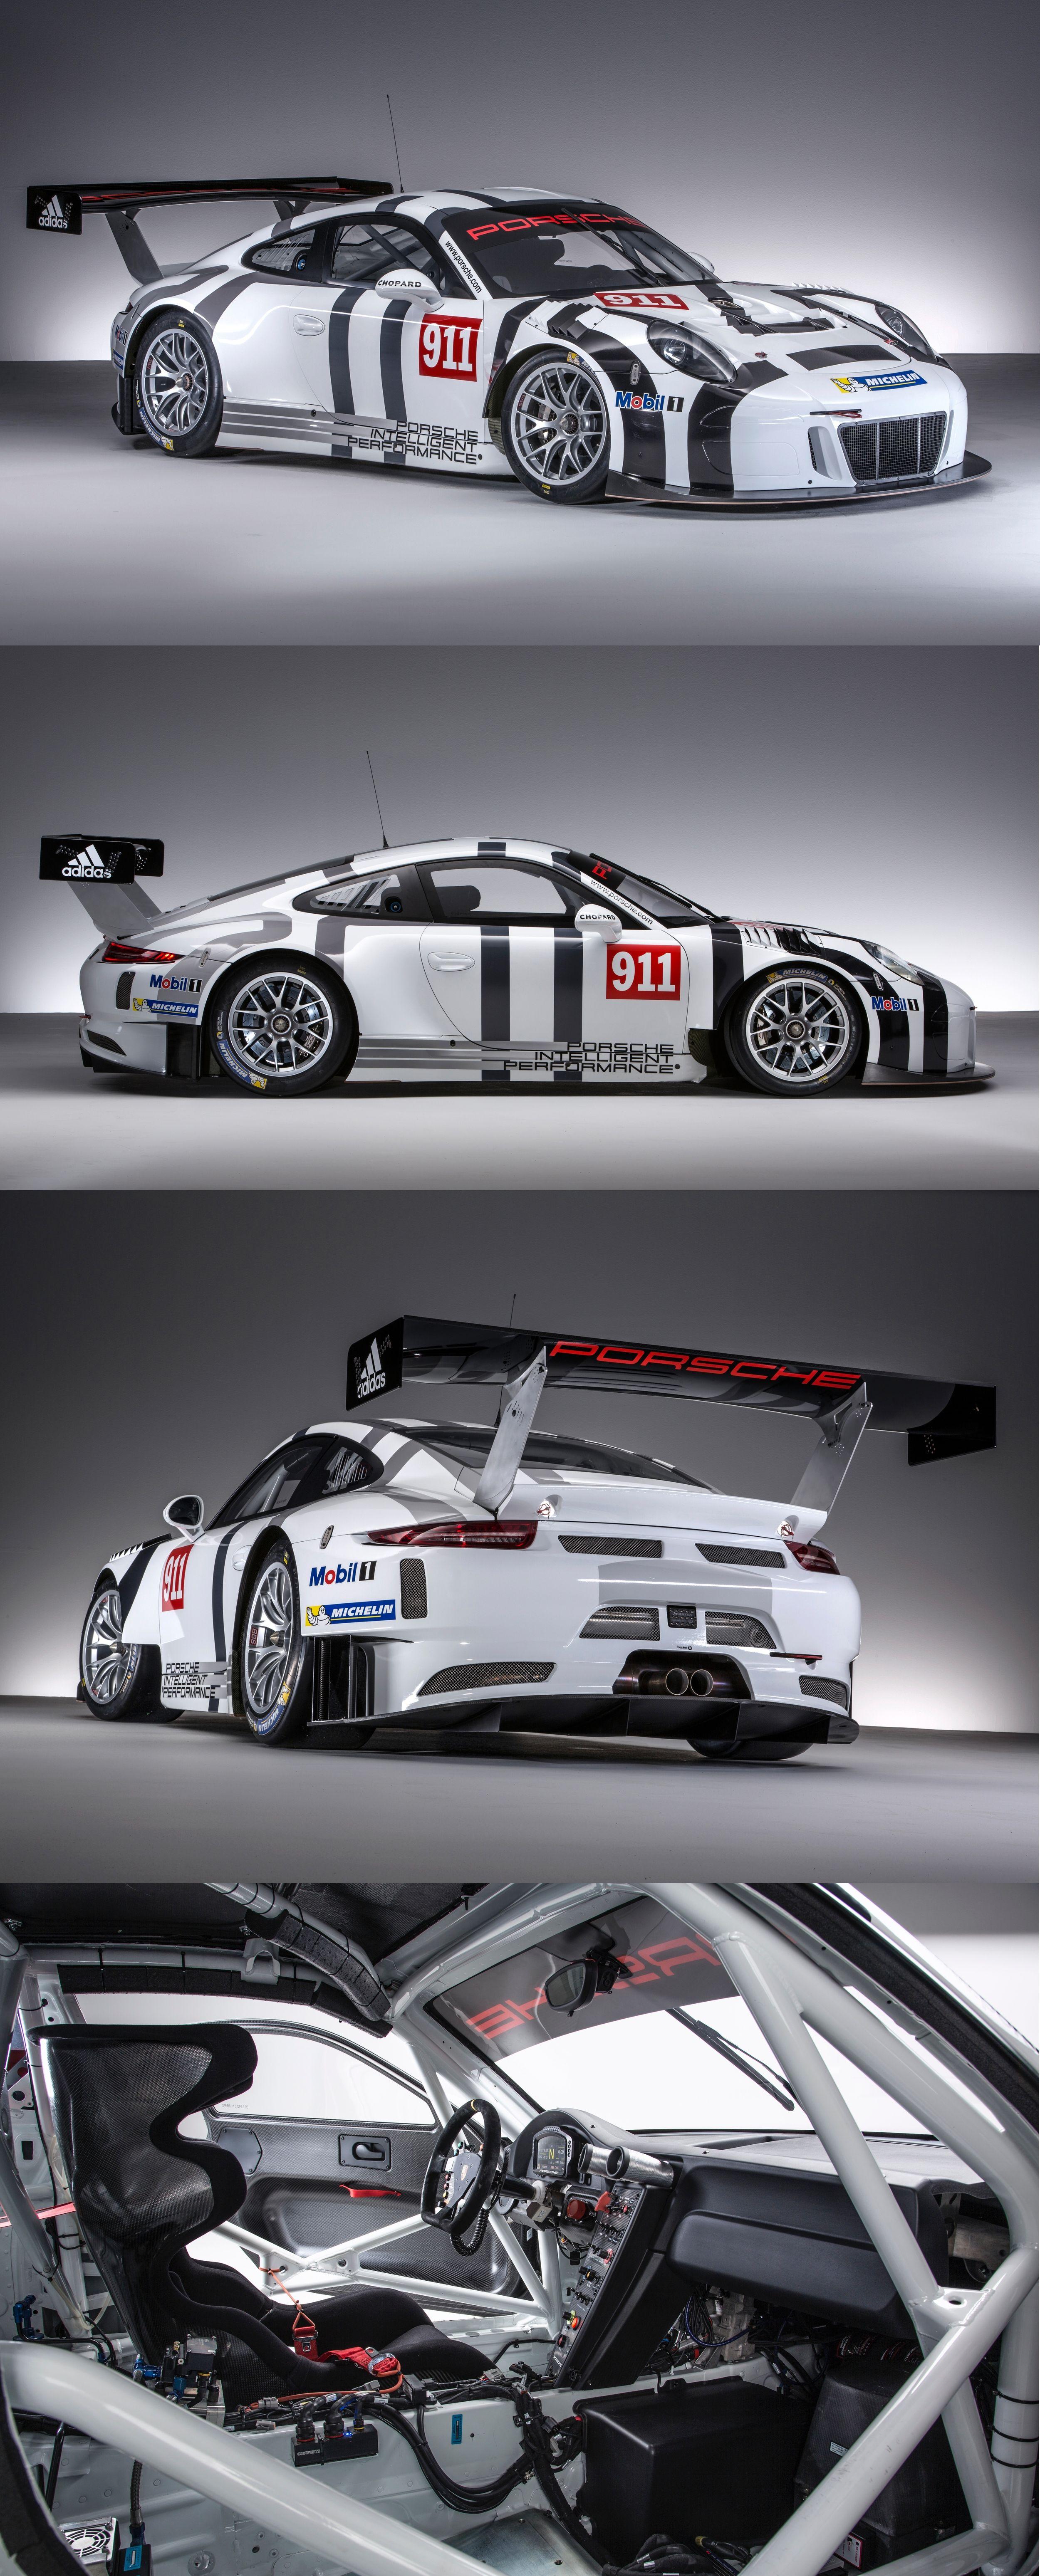 1f5cb62c85cb257334ab8b686f21fd74 Breathtaking Tamiya Porsche 911 Gt1 Full View Cars Trend